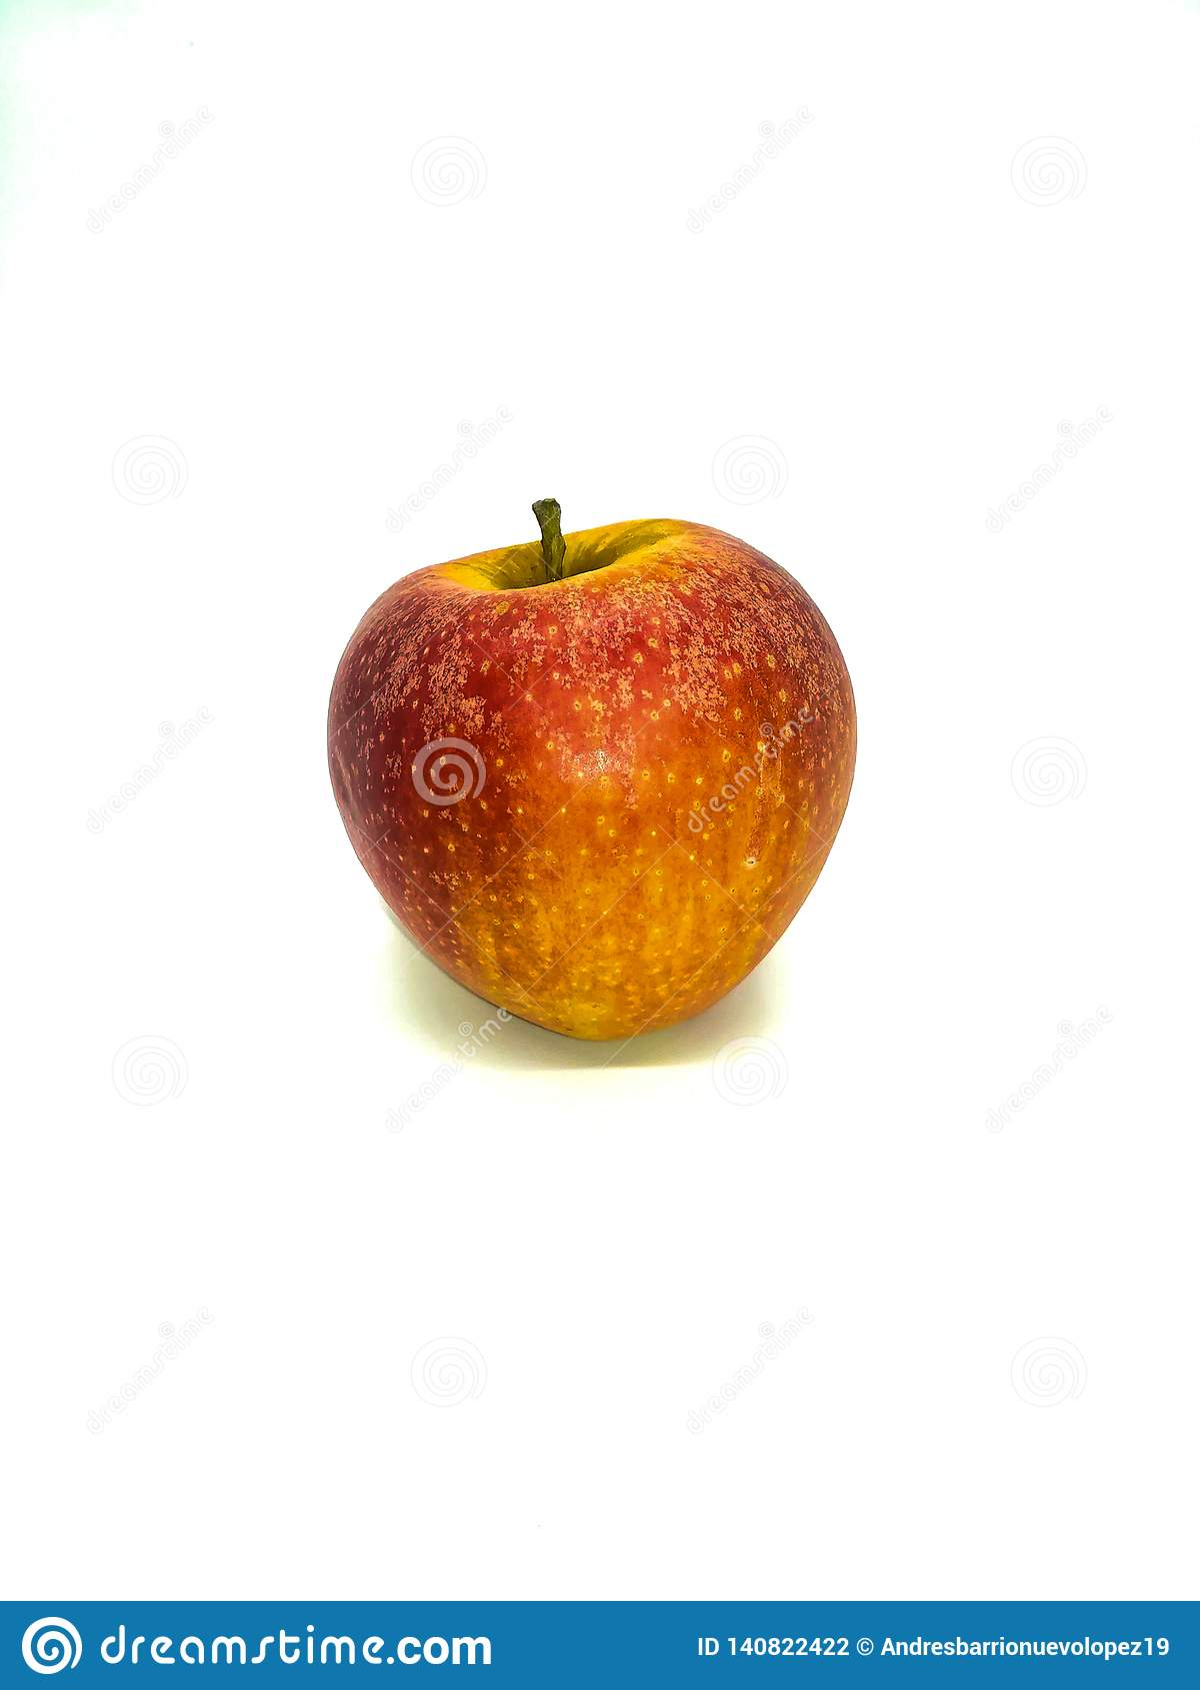 Roter Apfel mit gelben Flecken